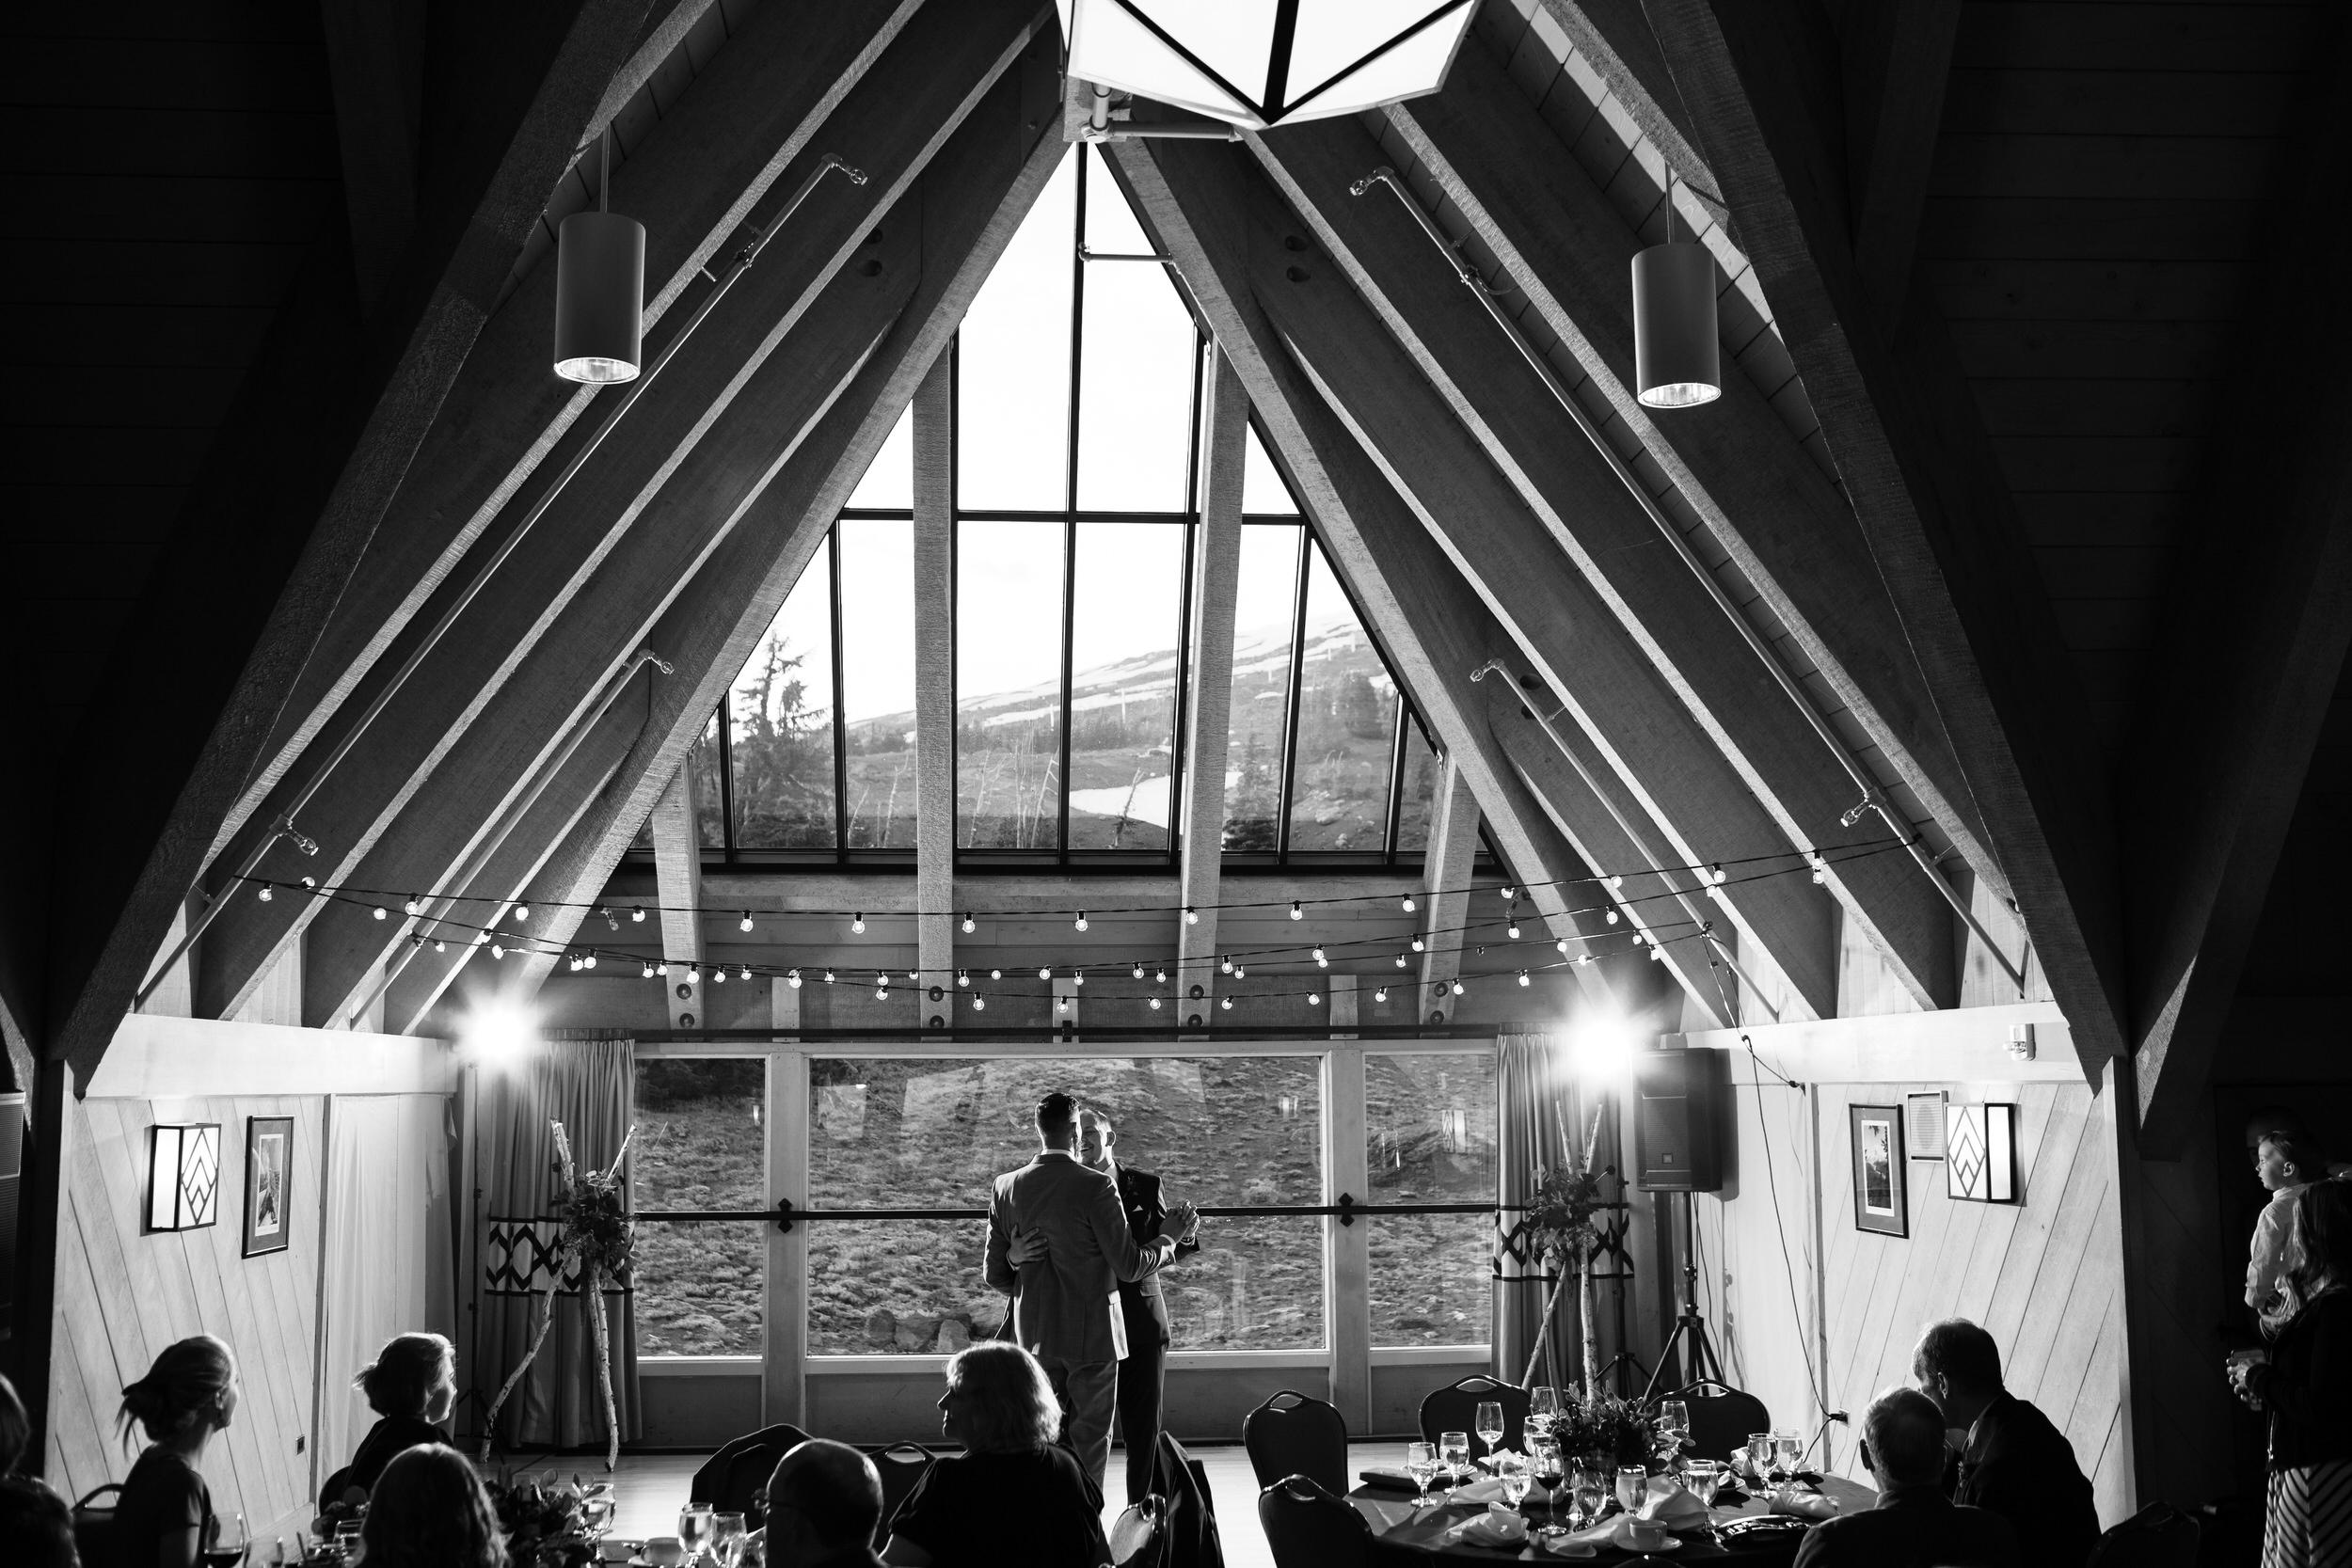 timberline_lodge_wedding_coltonjames_019